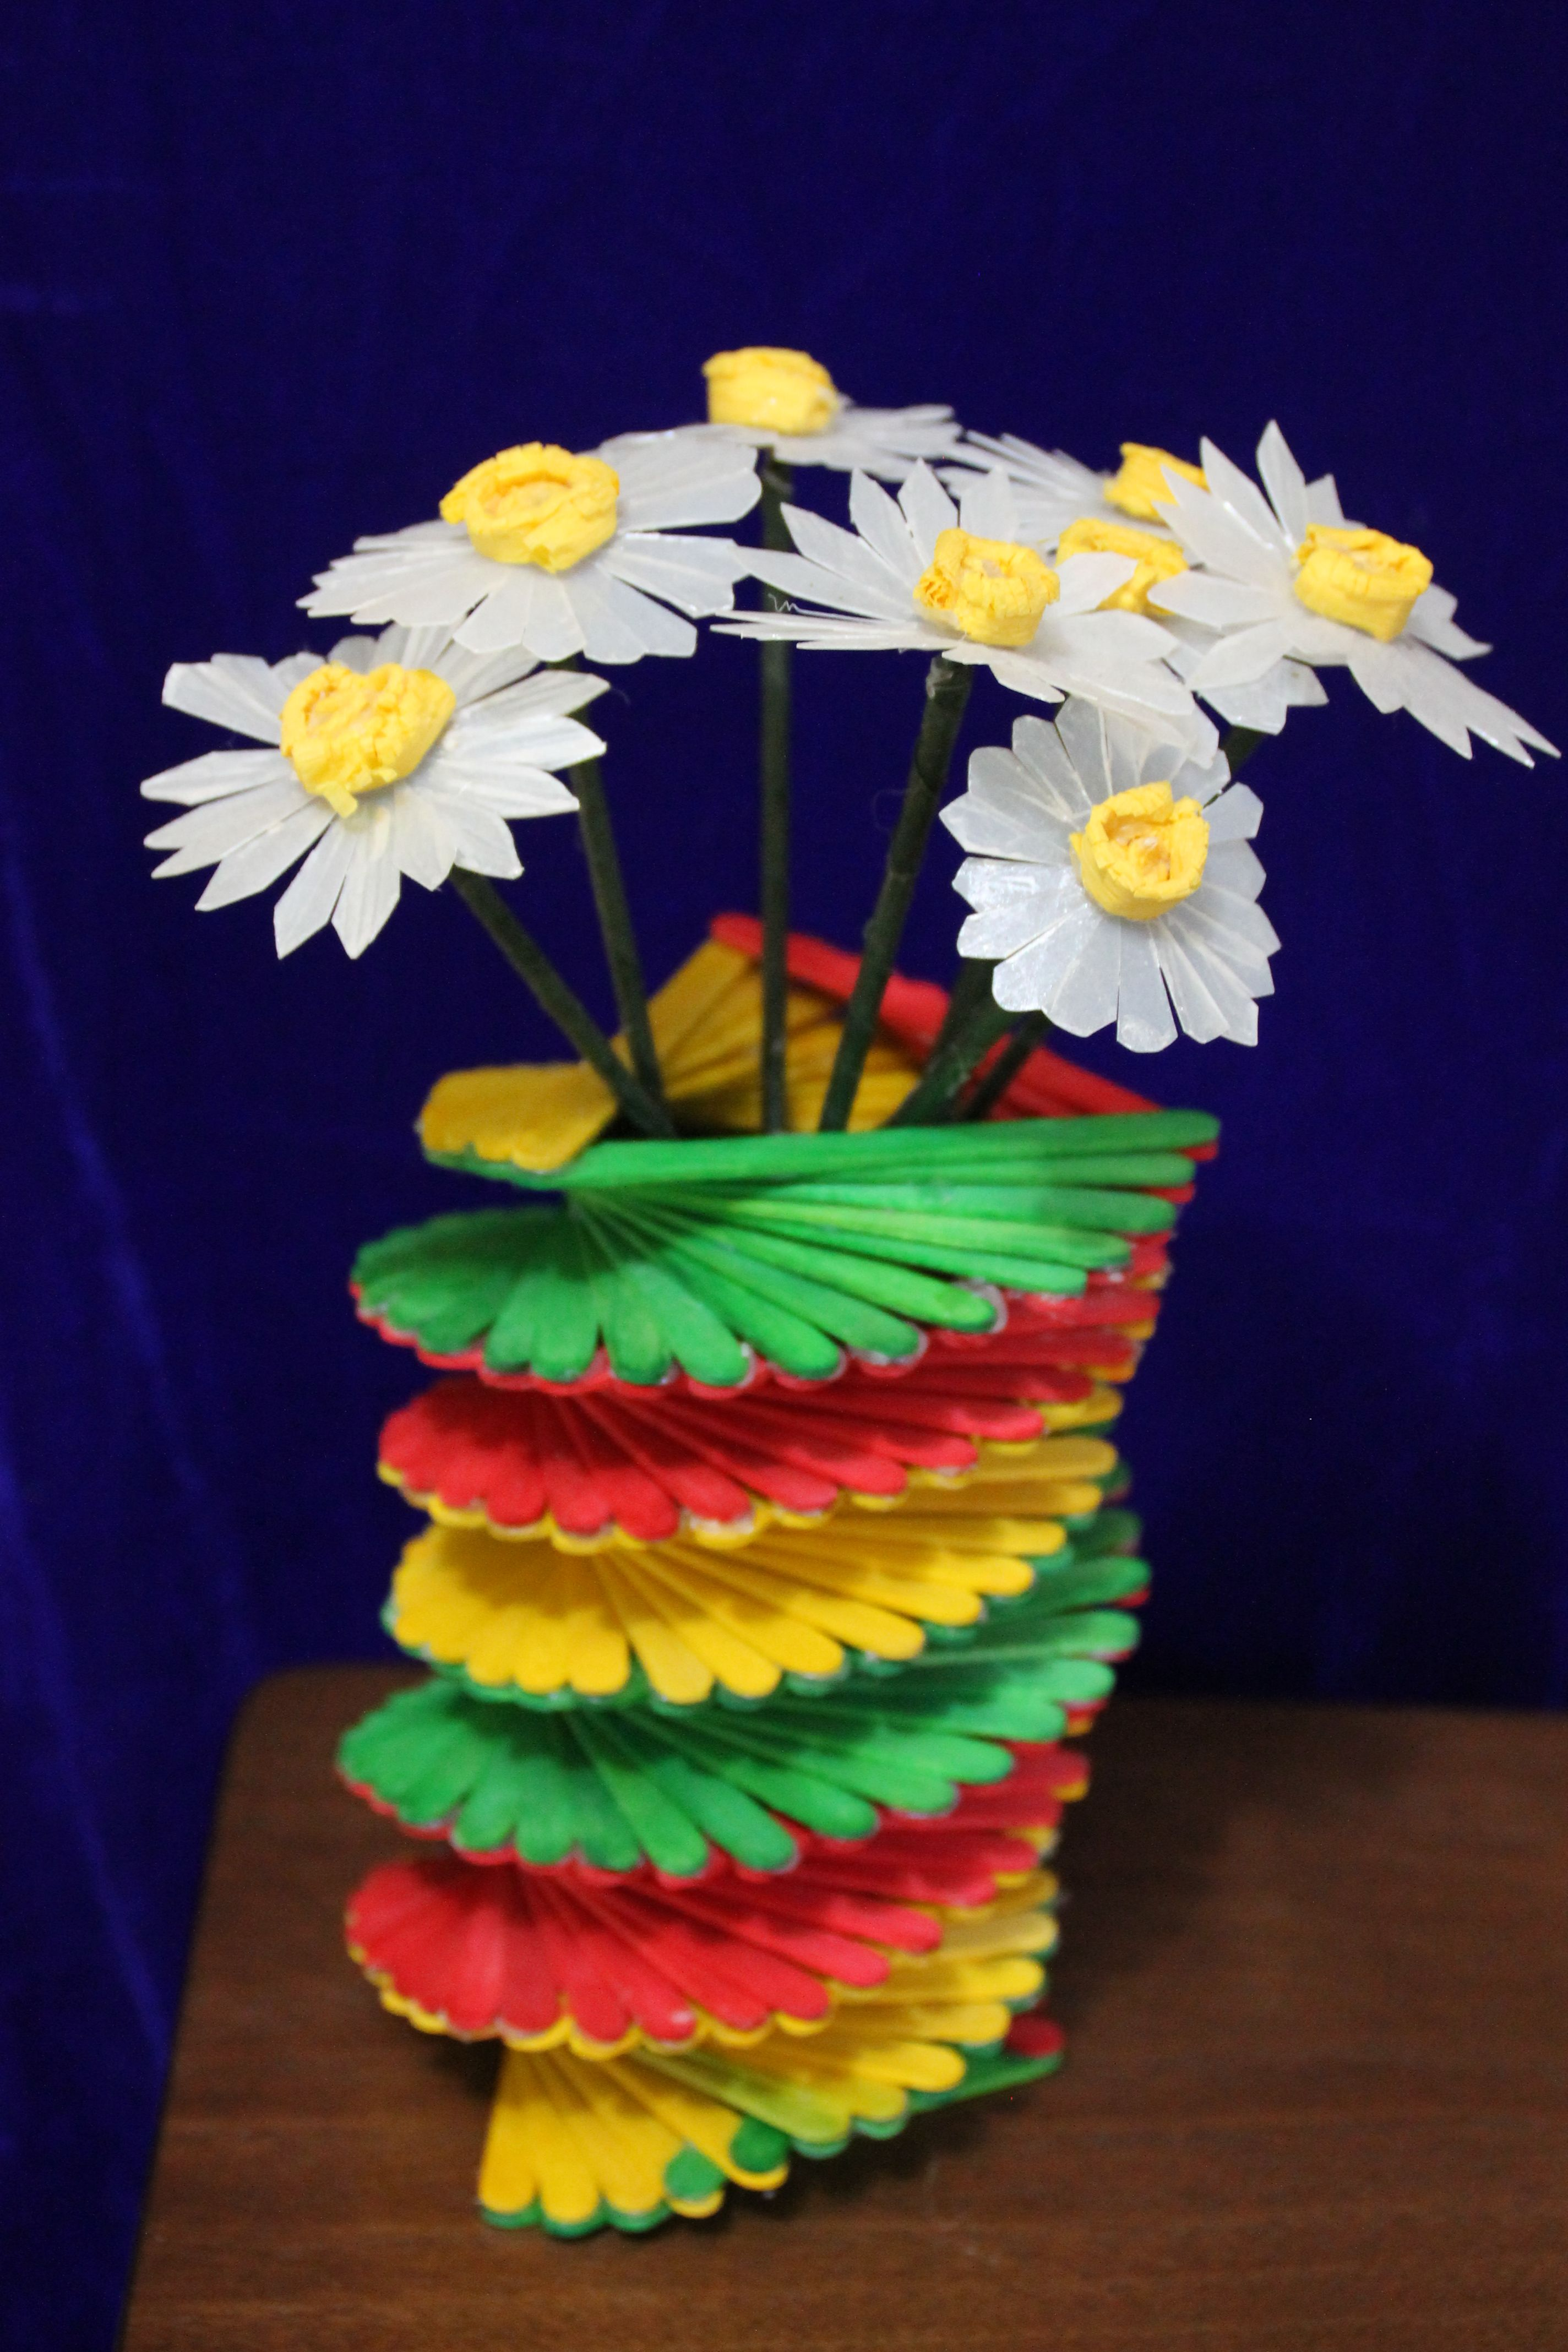 Icecreamsticks vase milkcan flowers best waste for Innovative craft ideas from waste